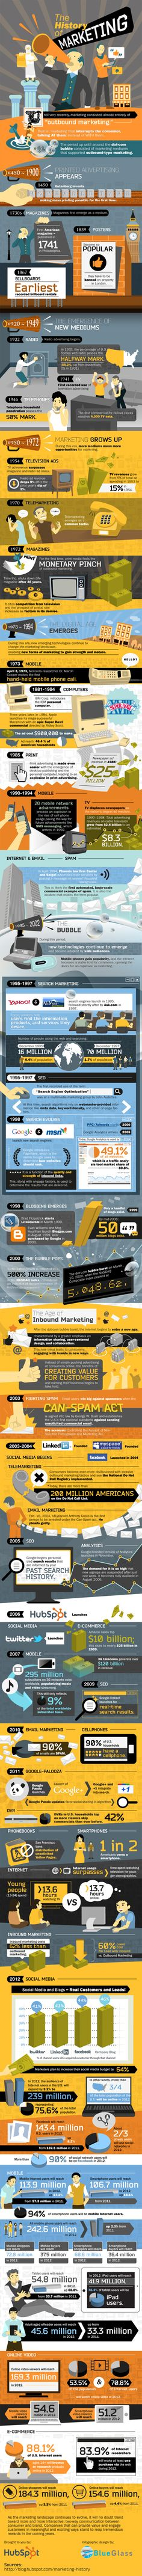 The History of Marketing